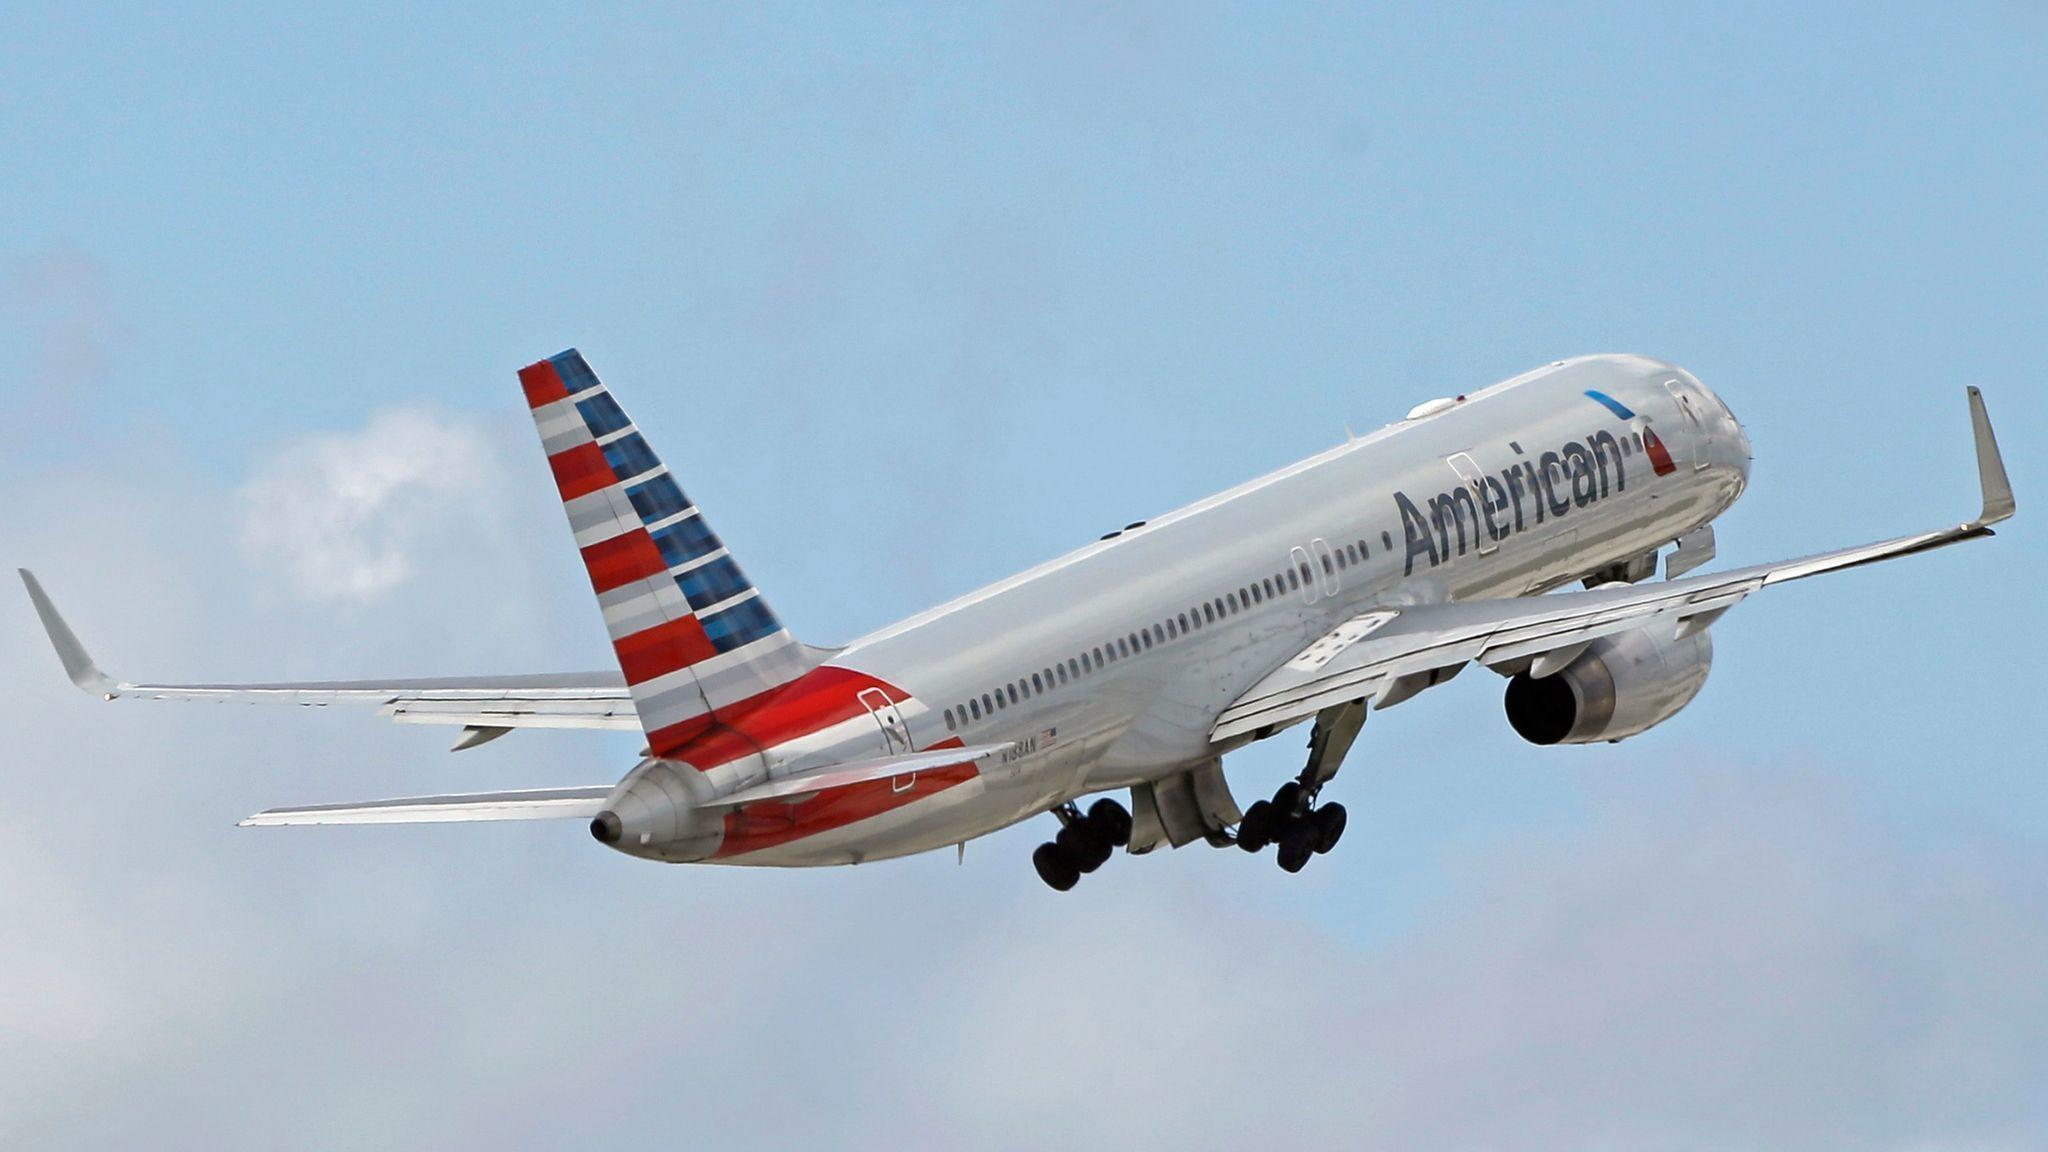 latimes.com - American Airlines announces pay raises, and investors balk